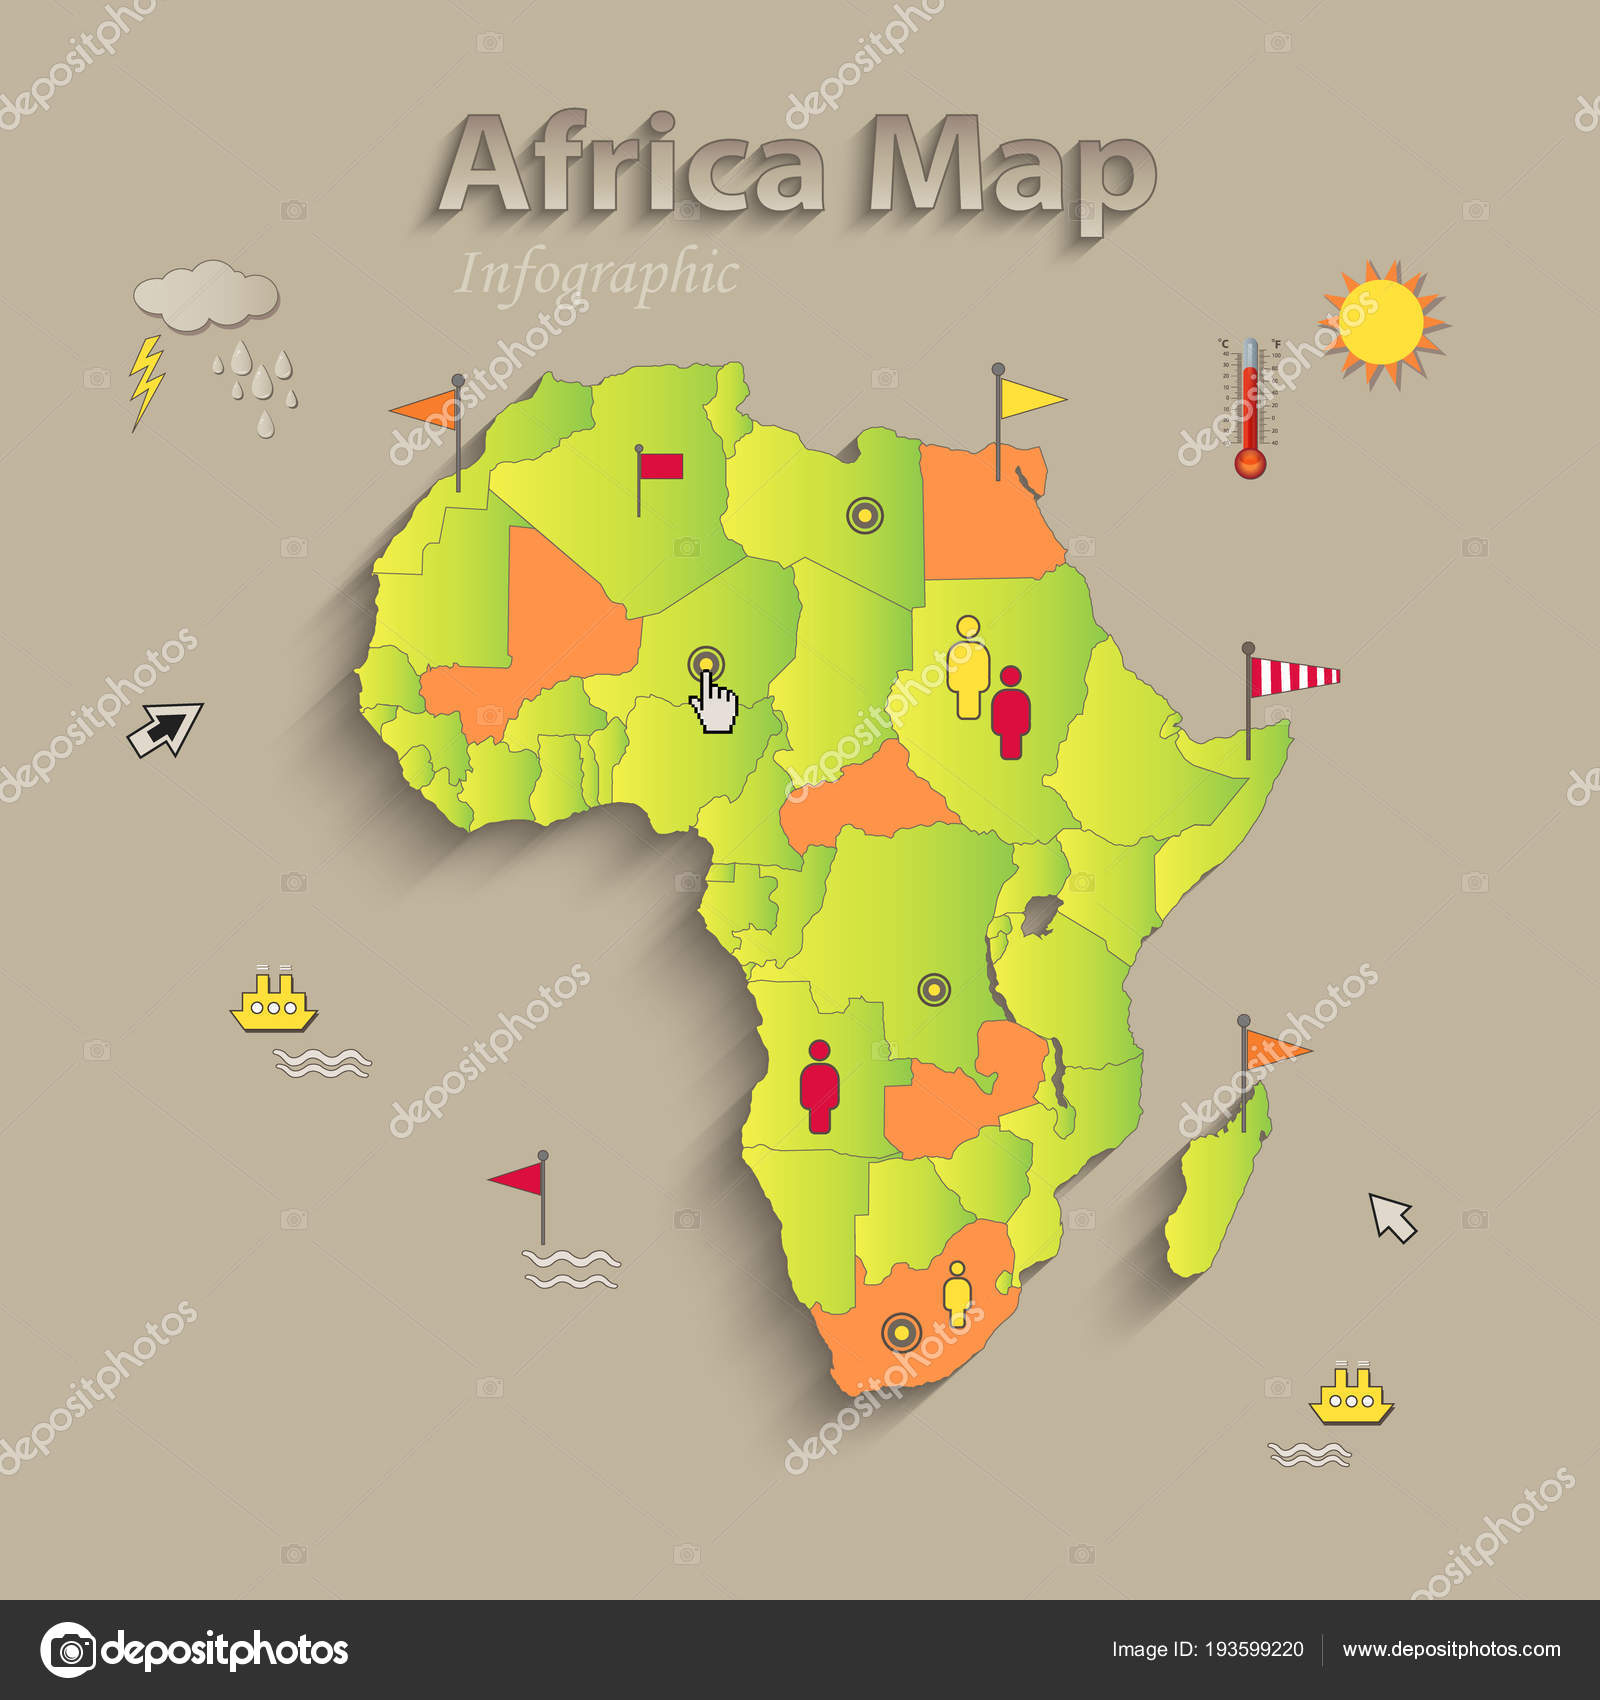 Afrika Karte Staaten.Afrika Karte Separate Staaten Infografiken Politische Karte Einzelne